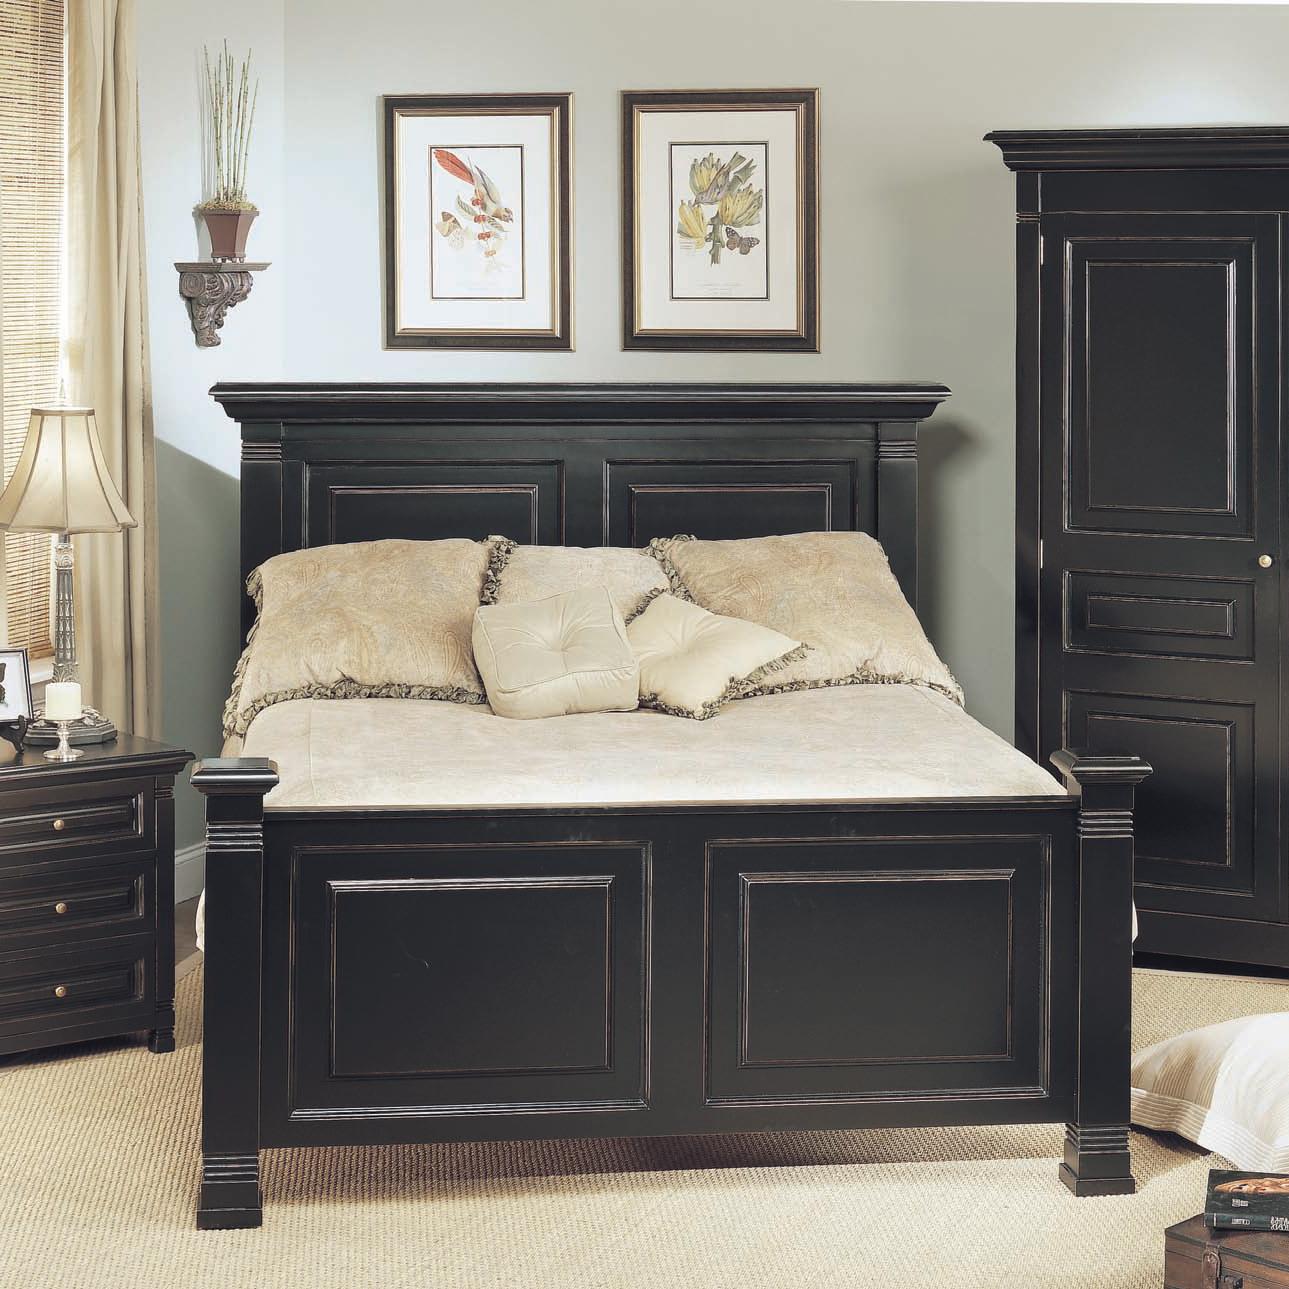 Old Biscayne Designs Custom Design Solid Wood Beds Lisette Wood Headboard  And Footboard Bed